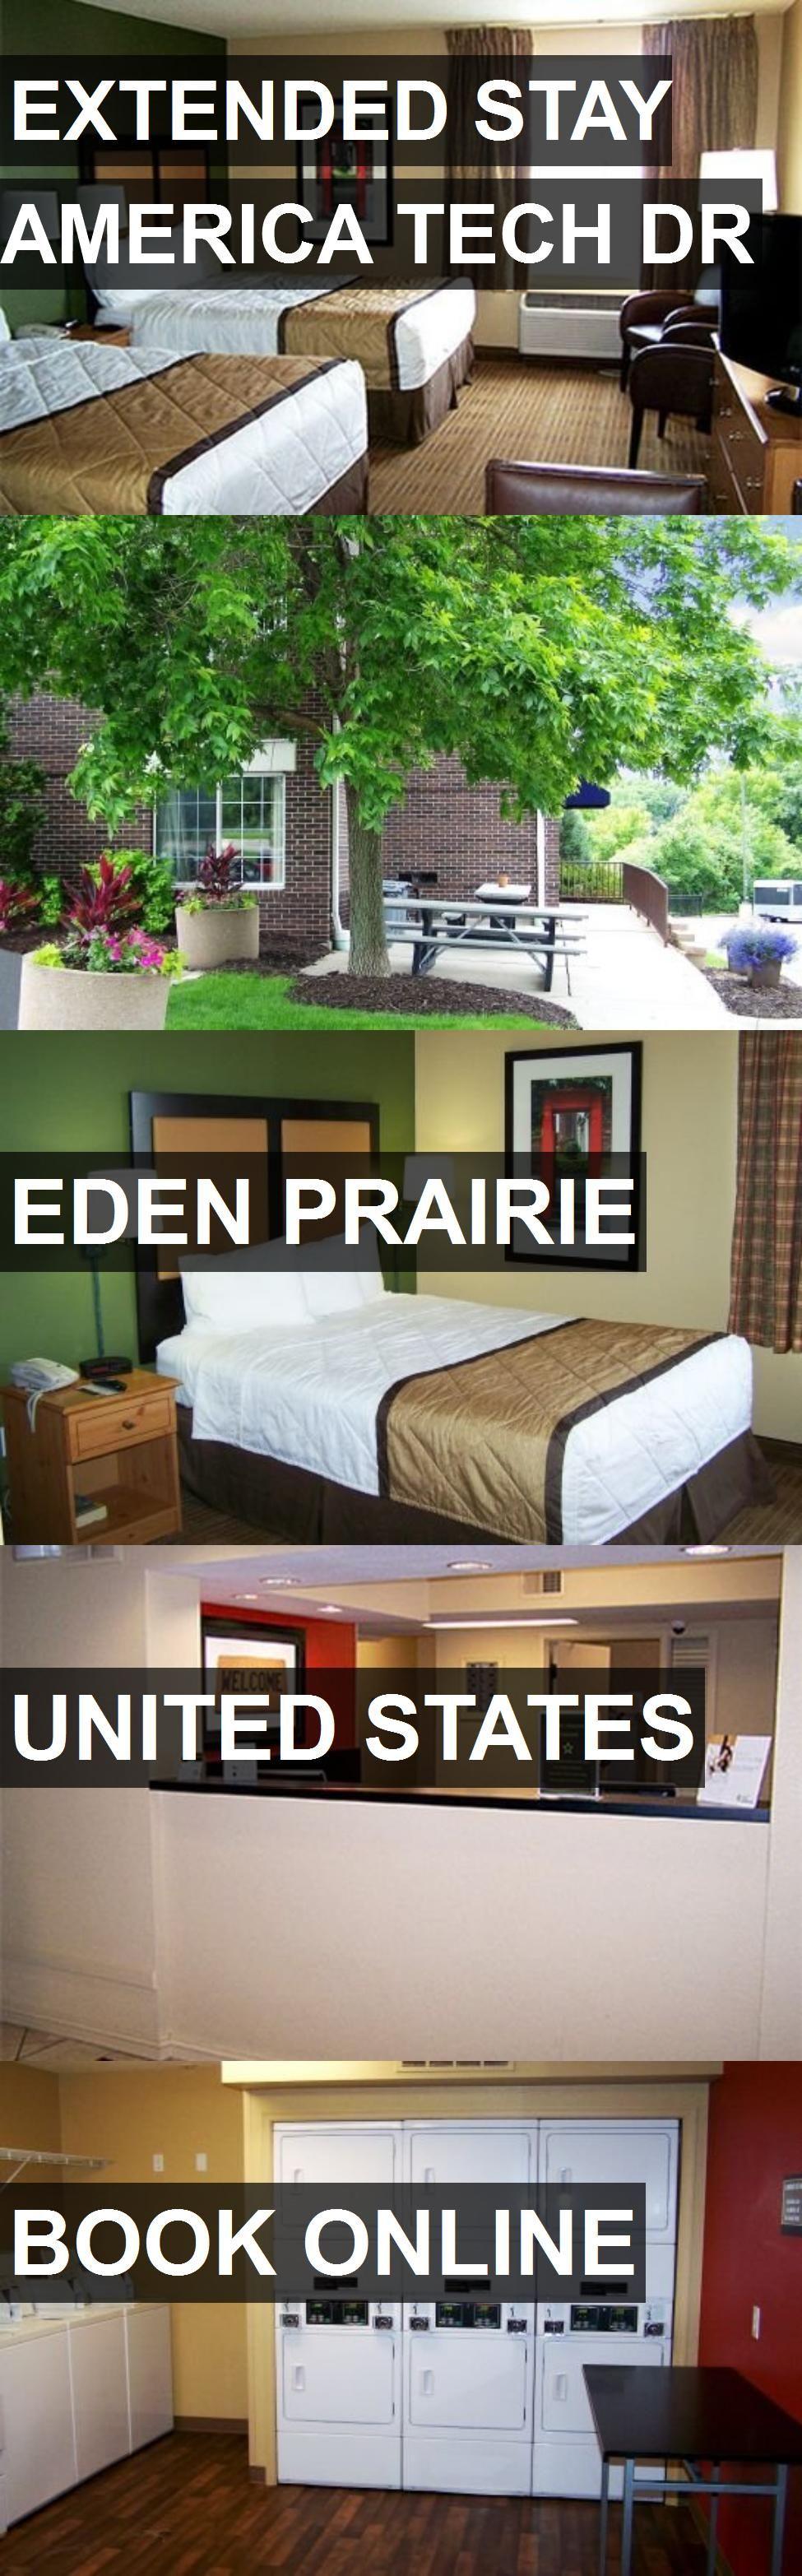 Best Hilton Garden Inn Atlanta Pictures Inspiration - Beautiful ...